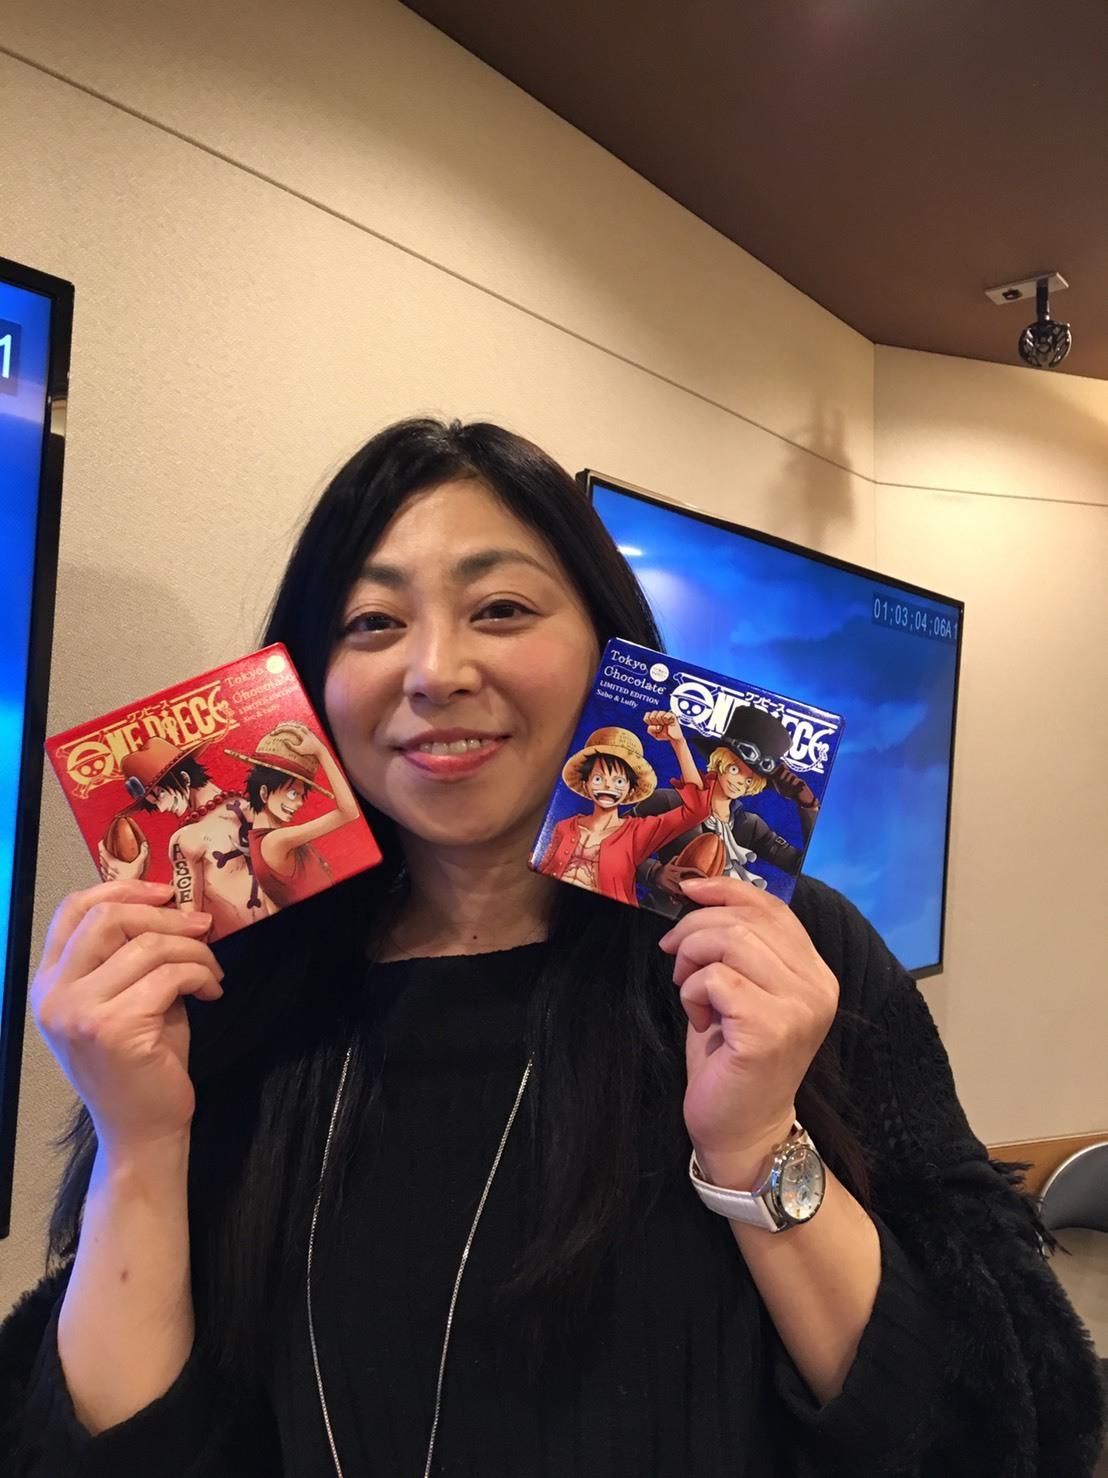 Dragon Ball Super: Dernière séance d'enregistrement des seiyûs pour l'anime avec Masakazu Morita, Masako Nozawa, Akemi Okamura